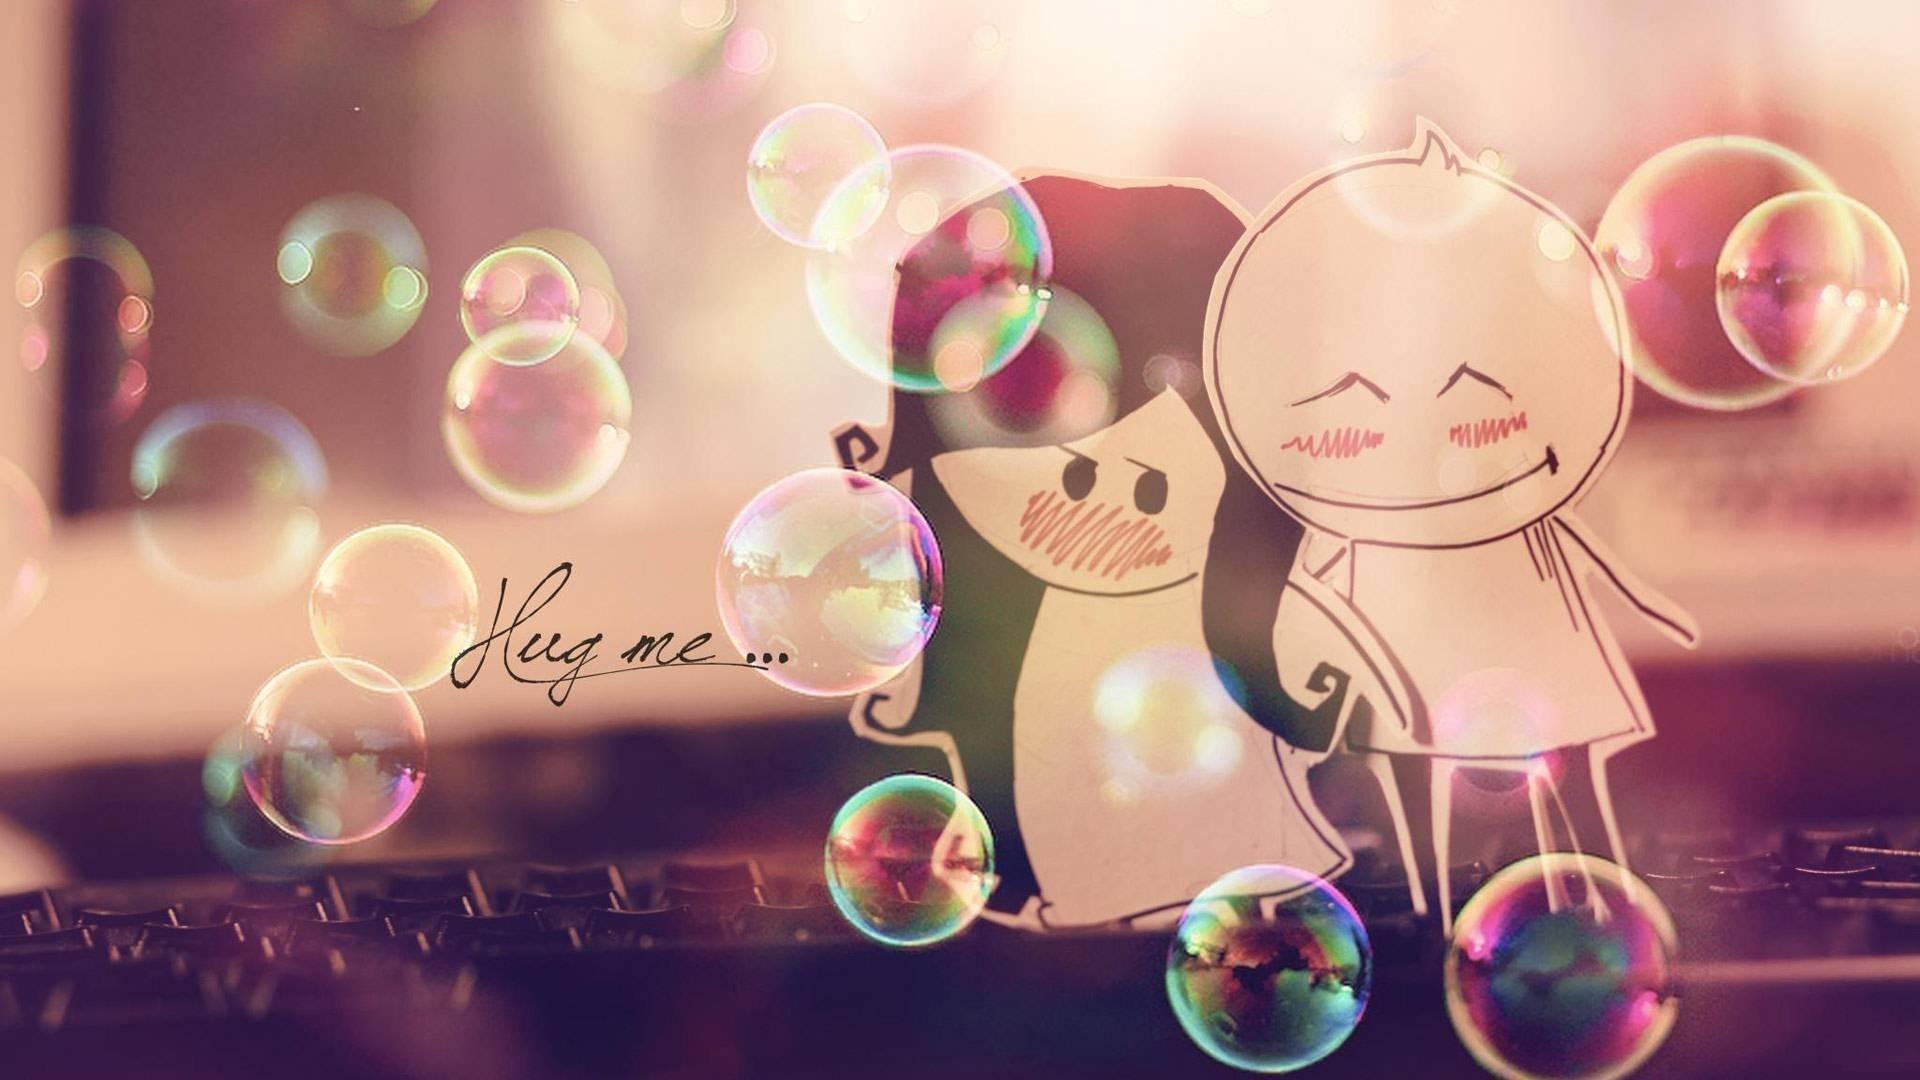 Cute-Love Wallpaper For WideScreen